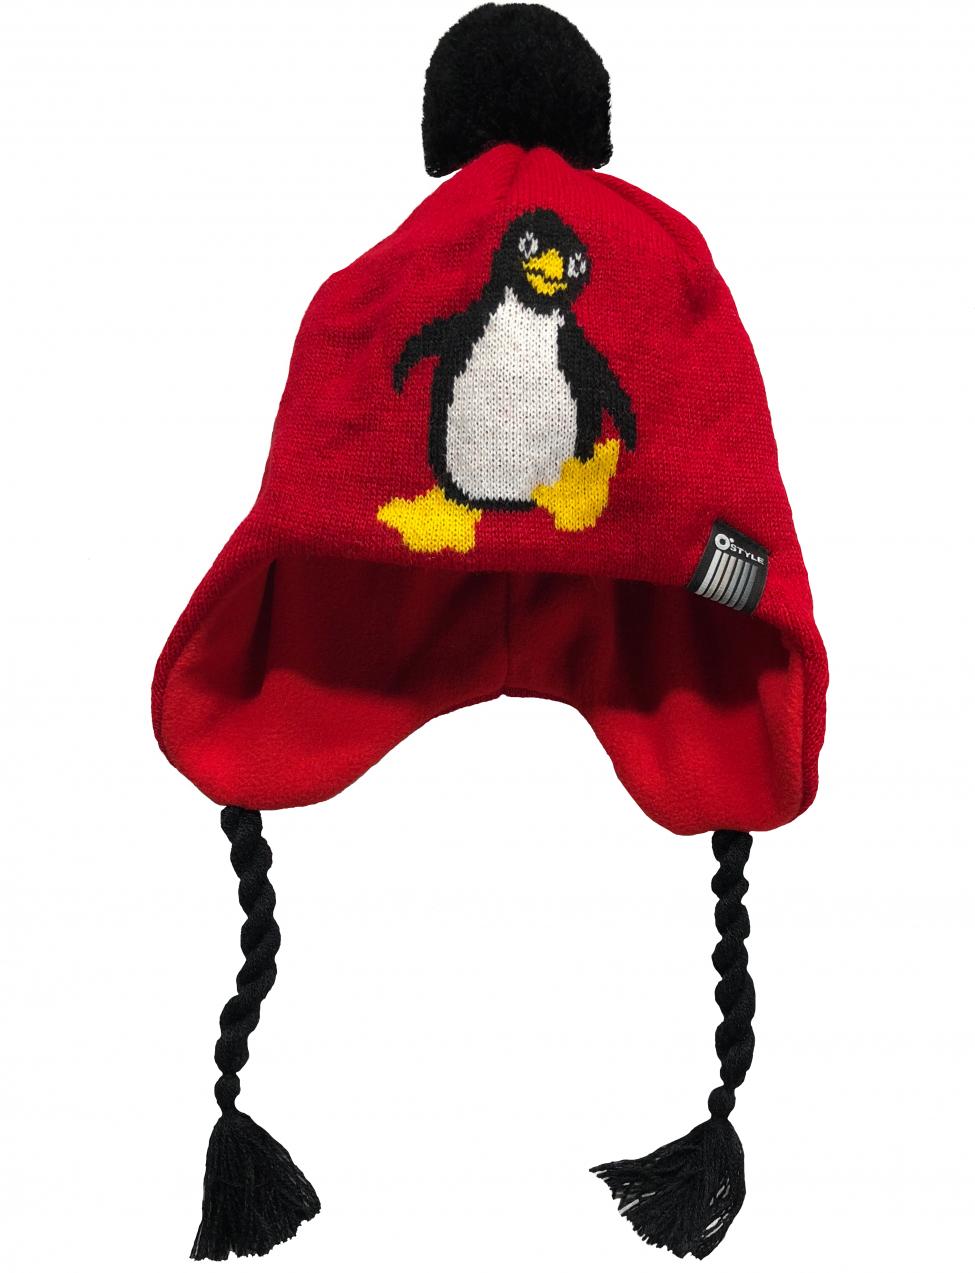 8aafae85d O'Style Dievčenská čiapka s tučniakom - červená značky O'Style ...